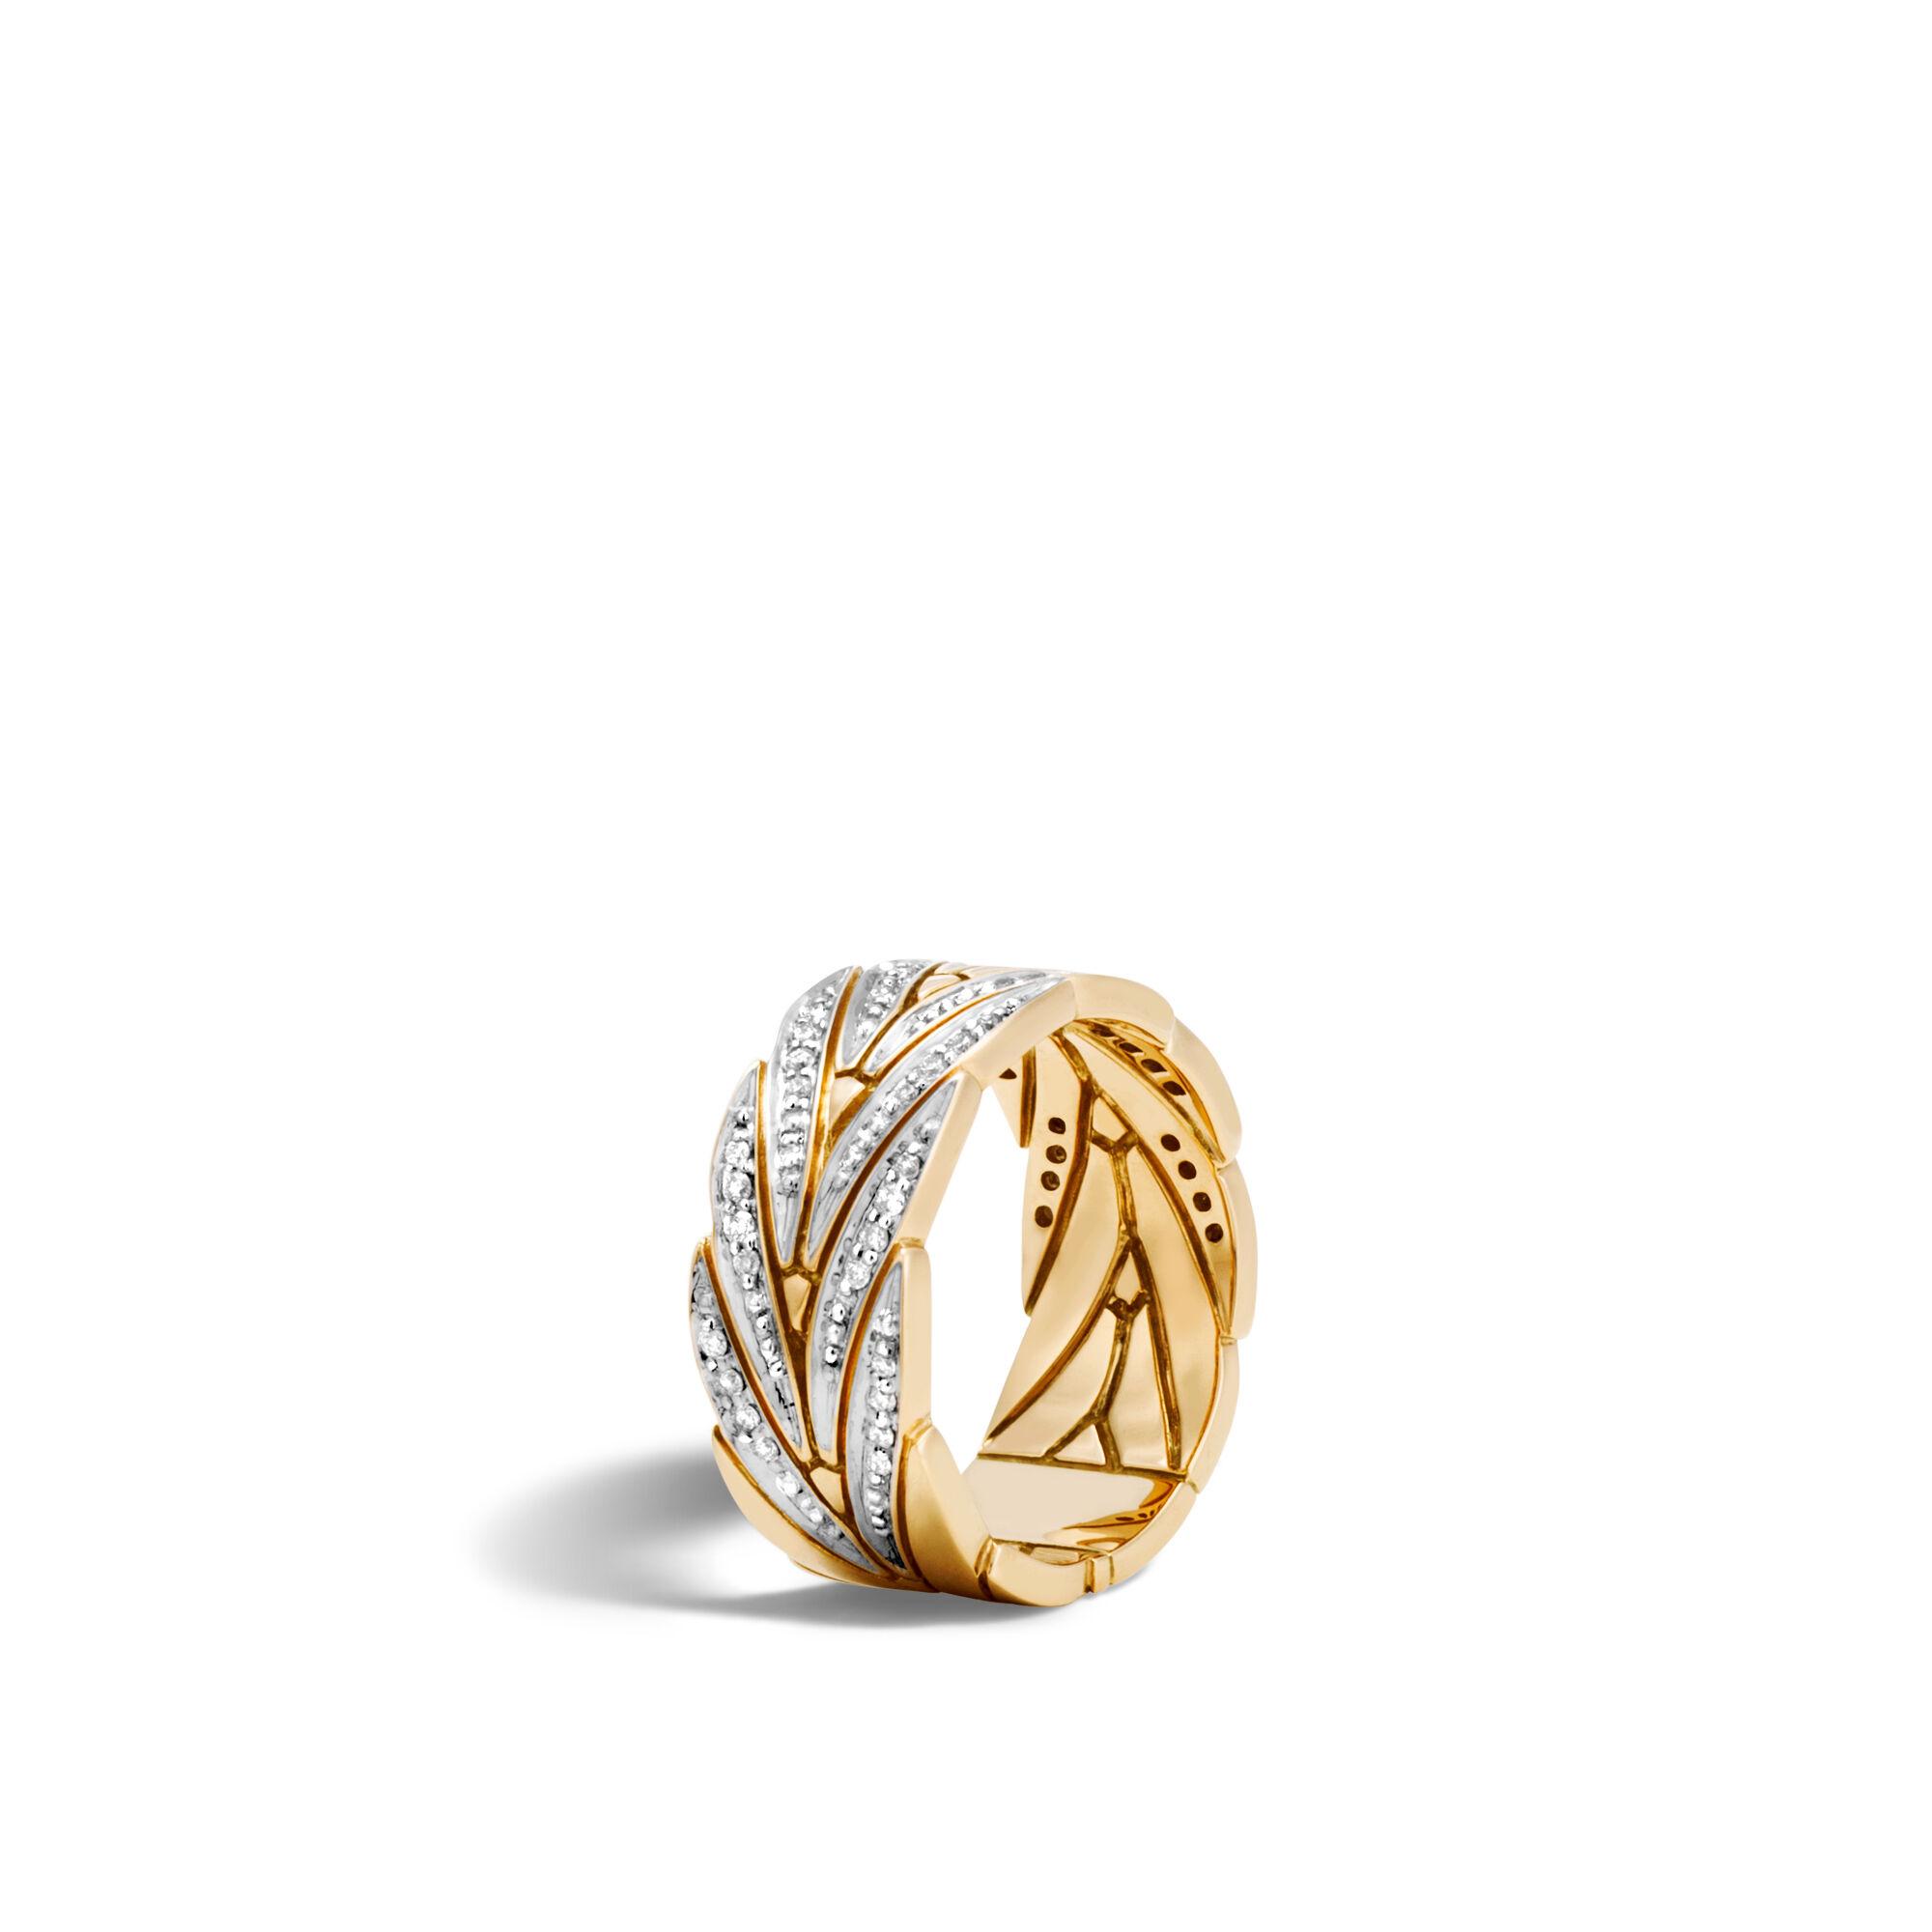 John Hardy Modern Chain Ring With Diamonds Ks57Tcv